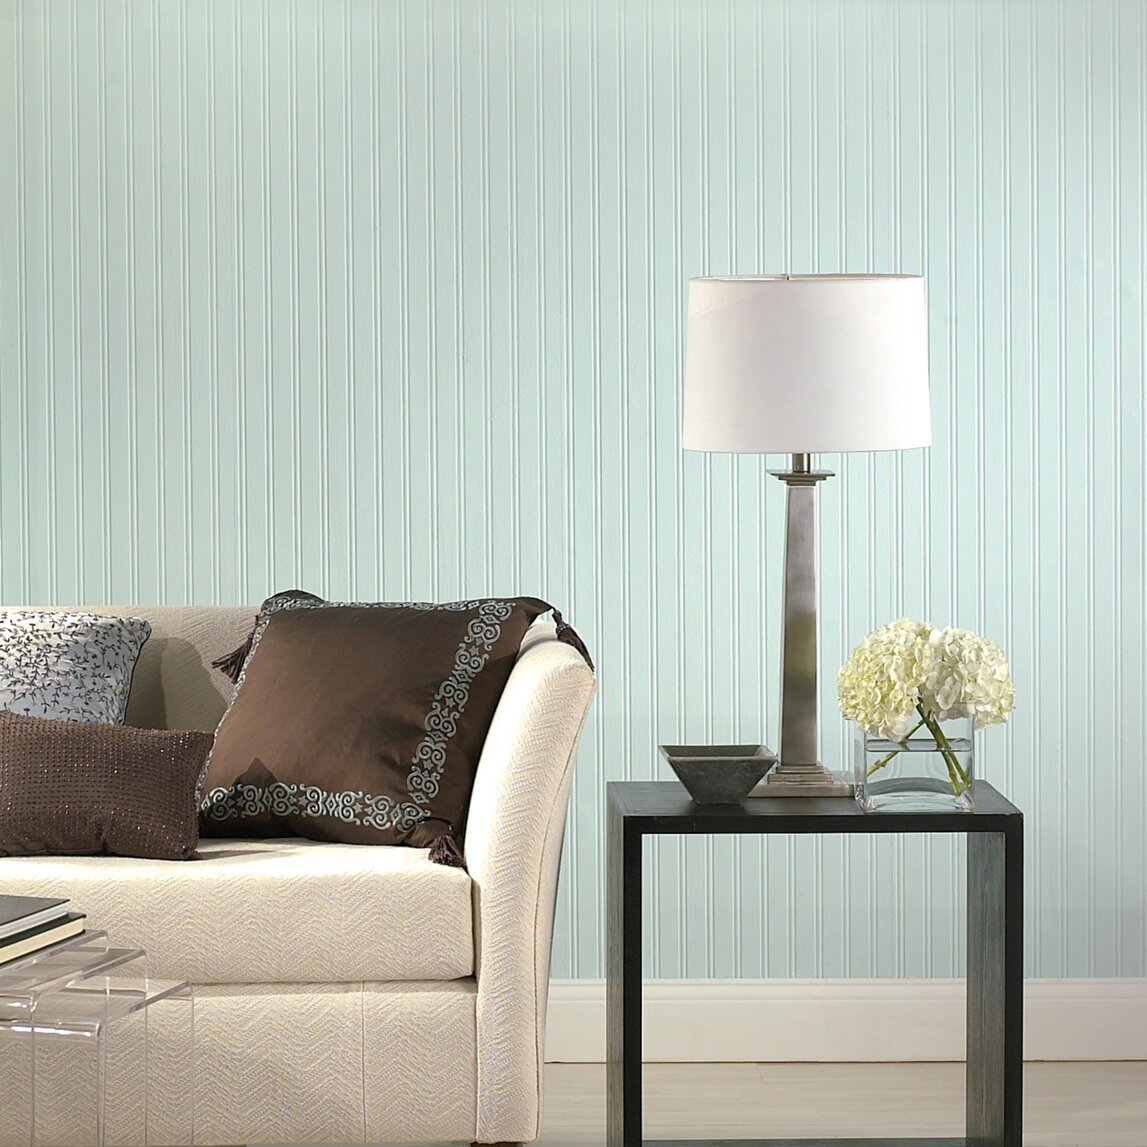 graham brown paintable prepasted beadboard 33 39 x 20. Black Bedroom Furniture Sets. Home Design Ideas